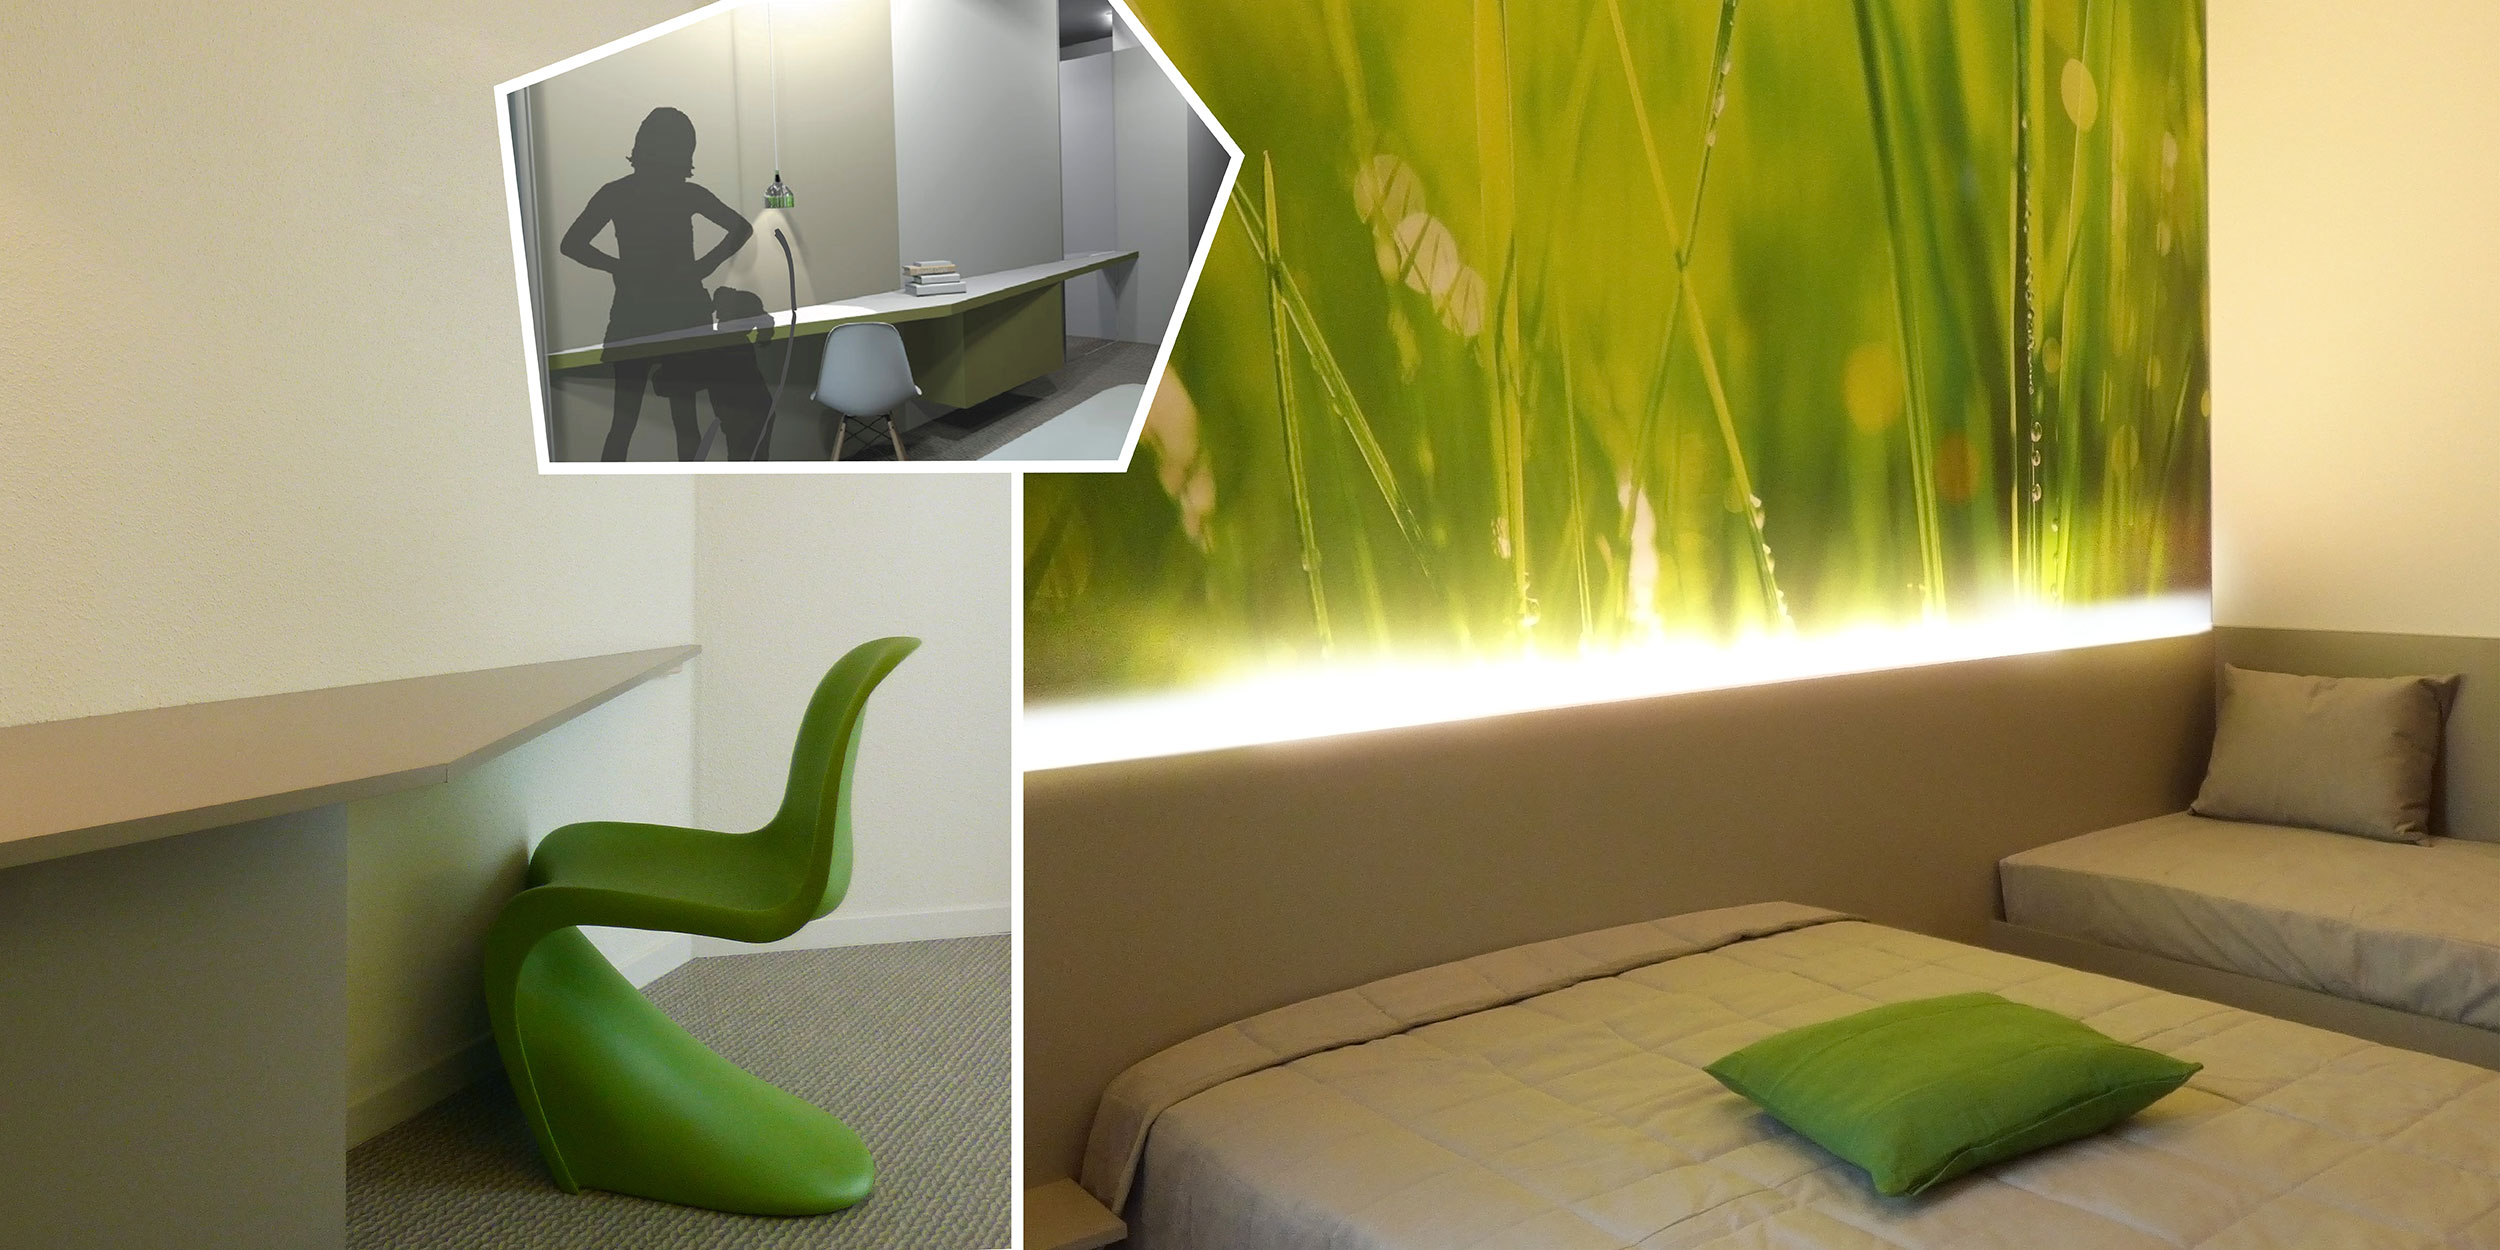 residence-hoteliere-mc-donald-2.jpg